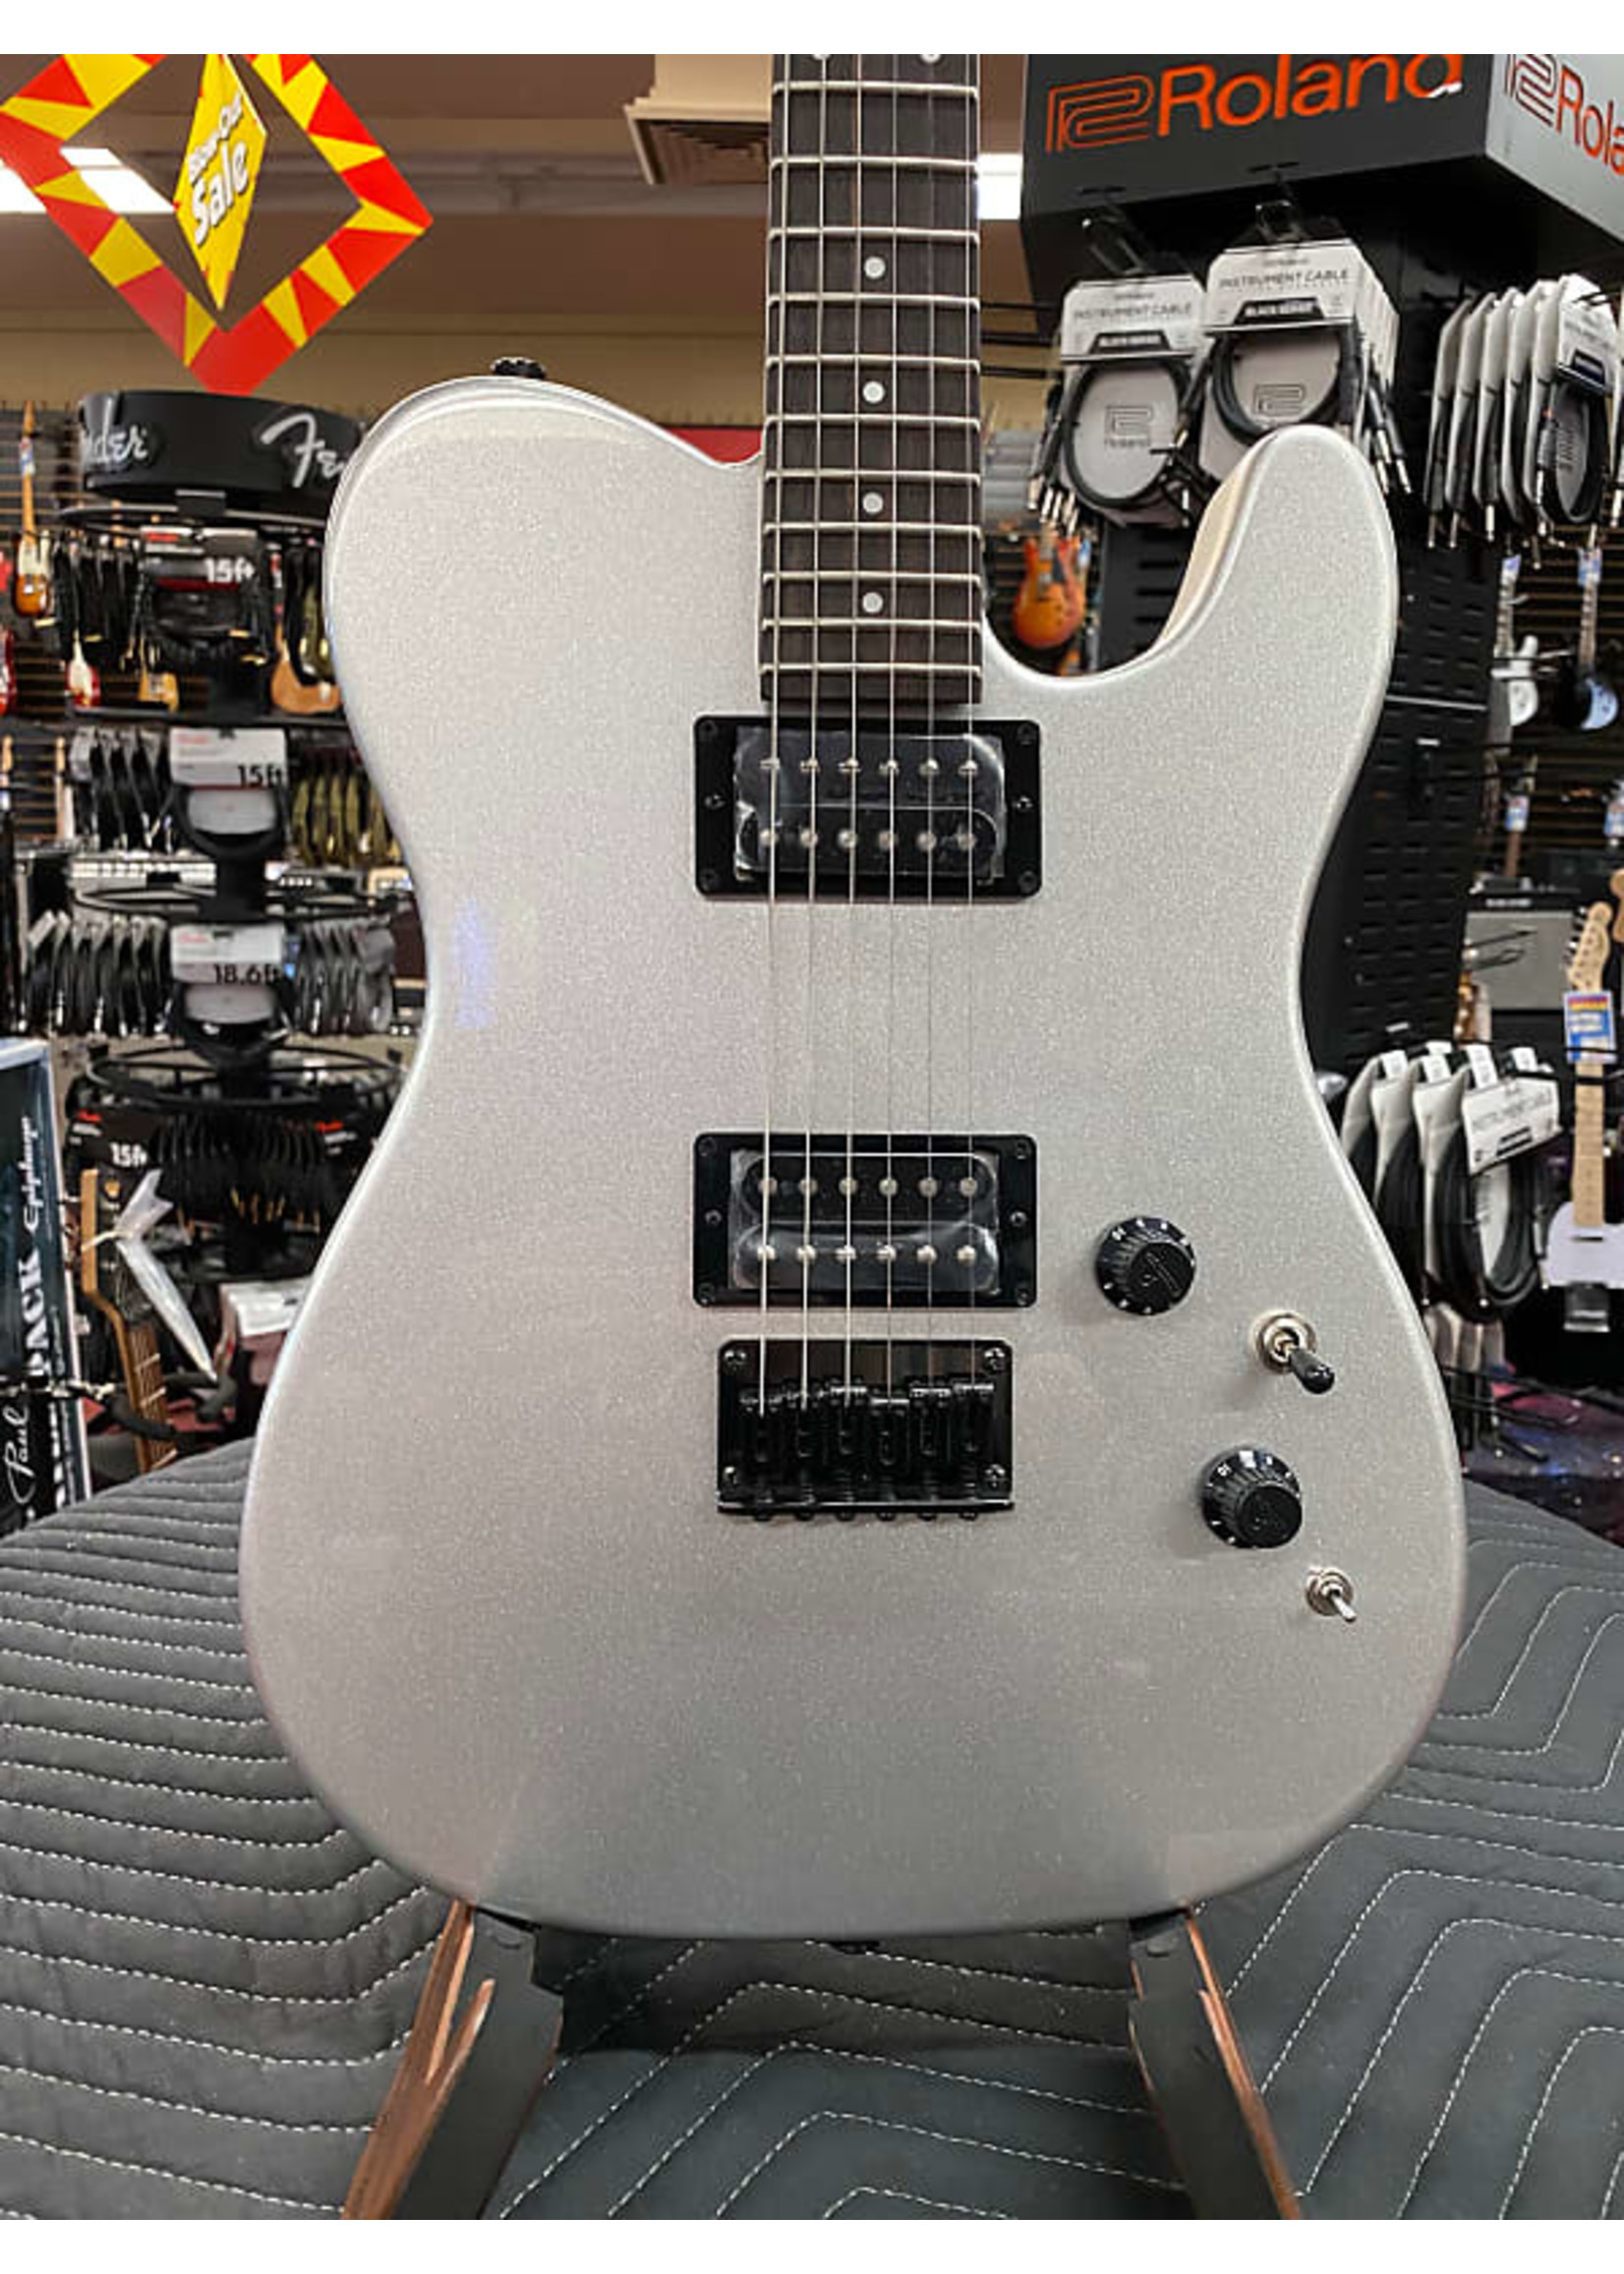 Fender Fender Boxer Series Telecaster HH, Rosewood Fingerboard, Inca Silver